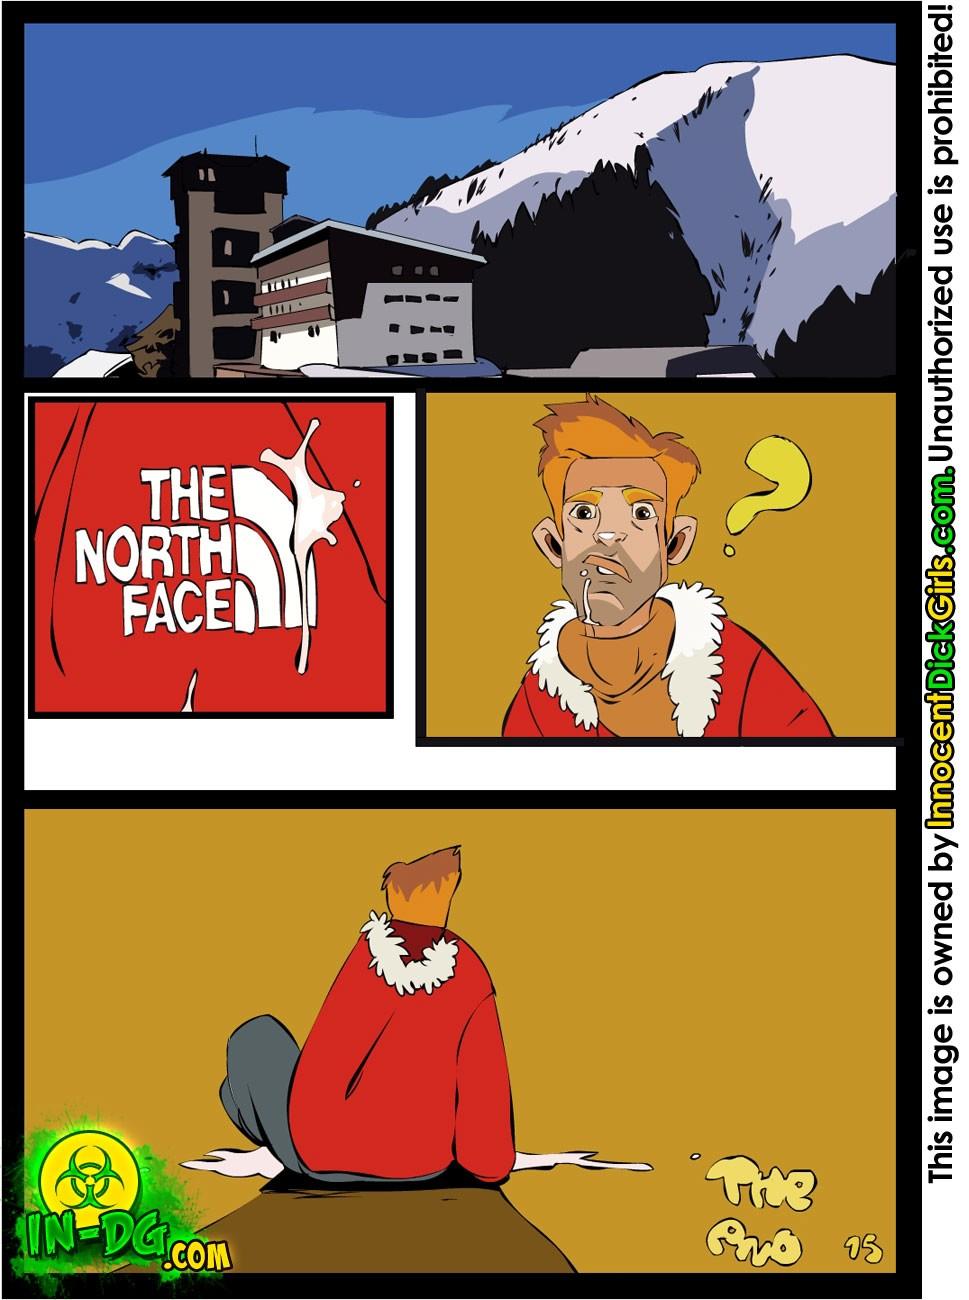 The Free Ski Pass 015